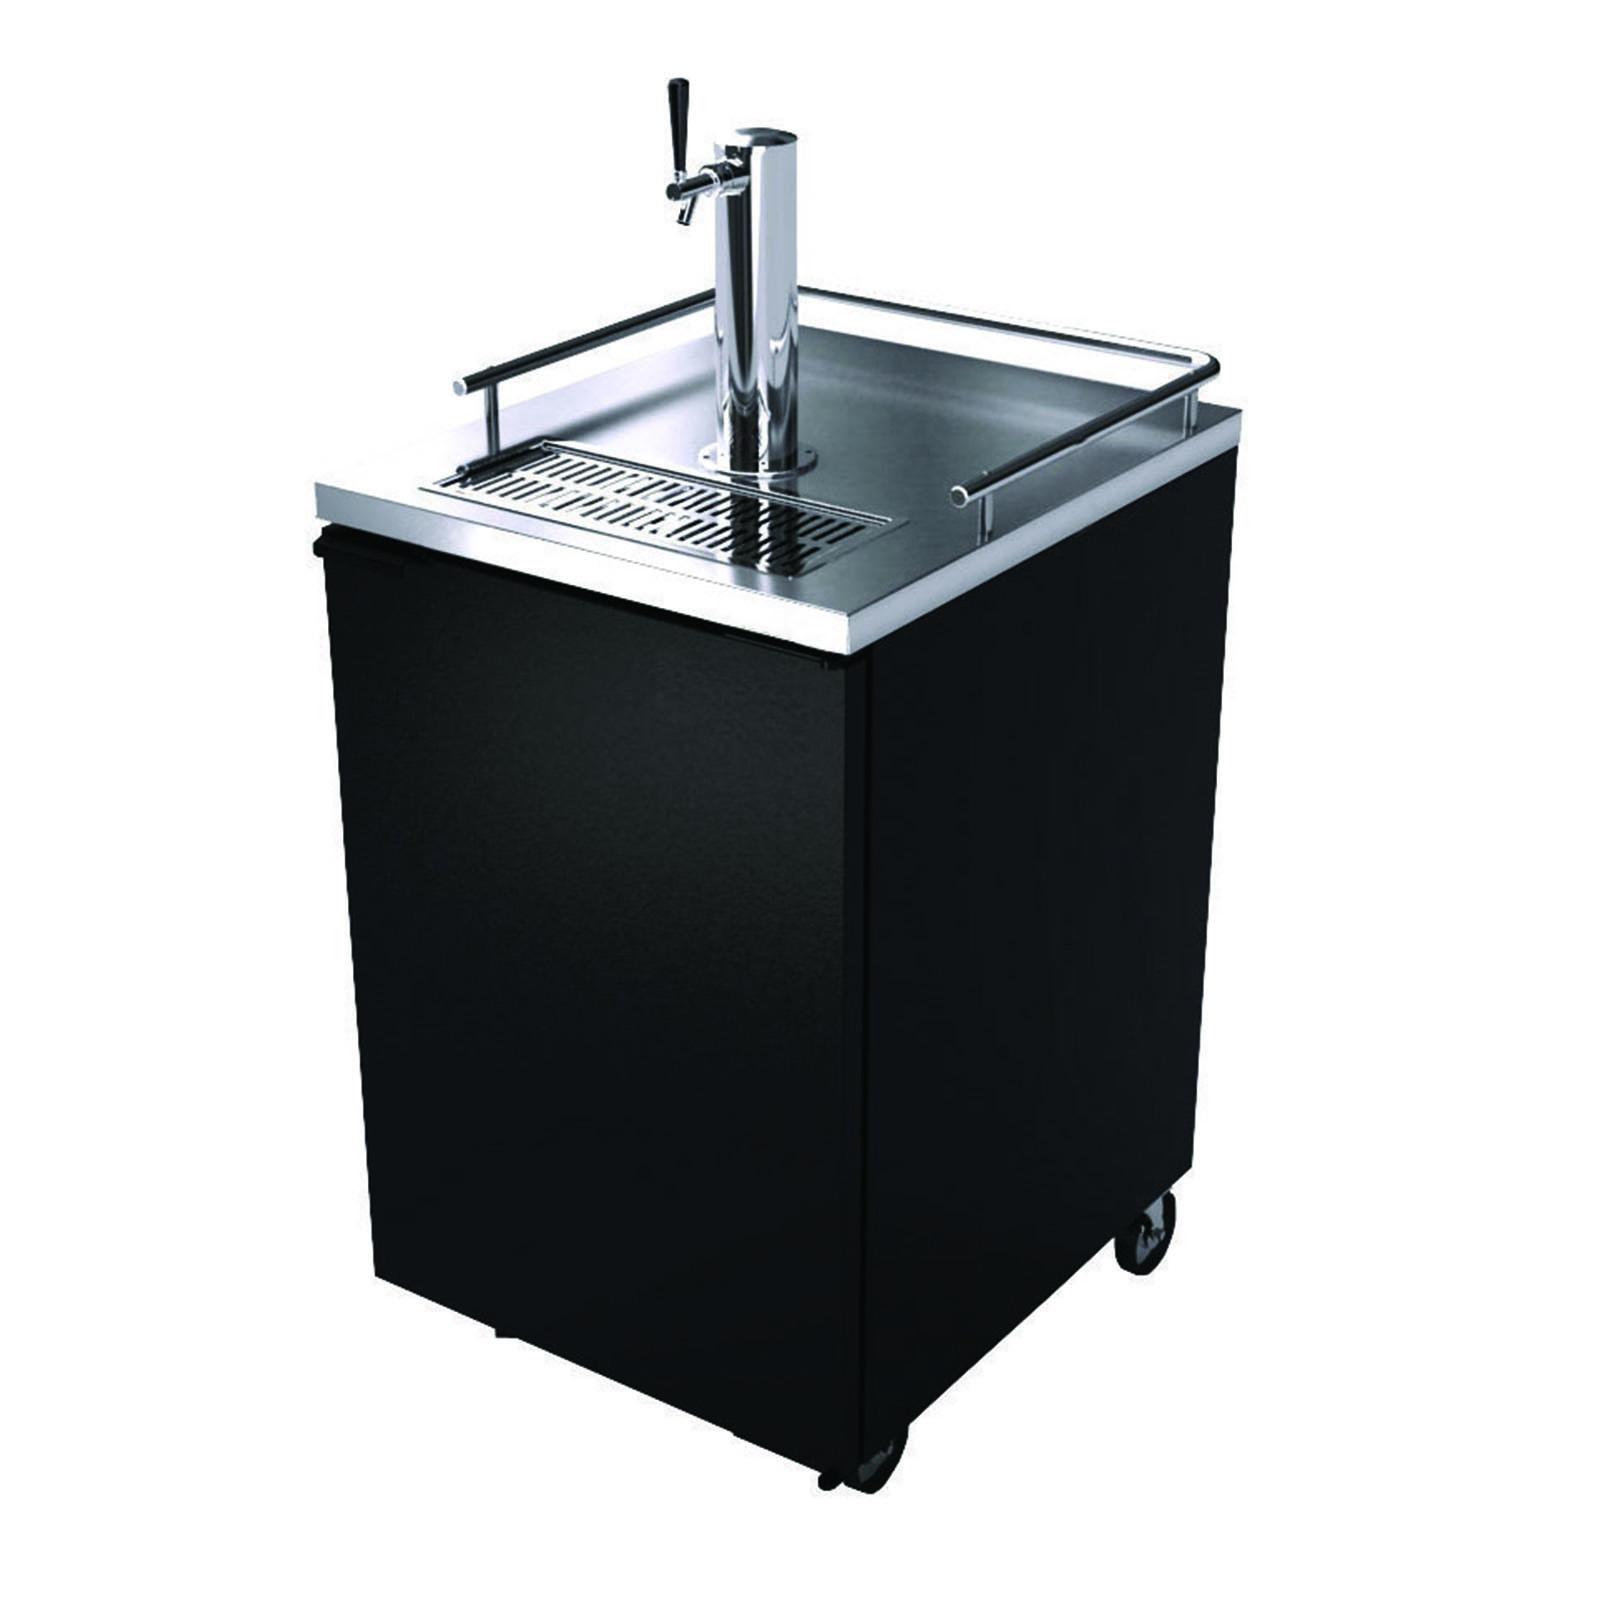 BK Resources DBC-11-24 draft beer cooler